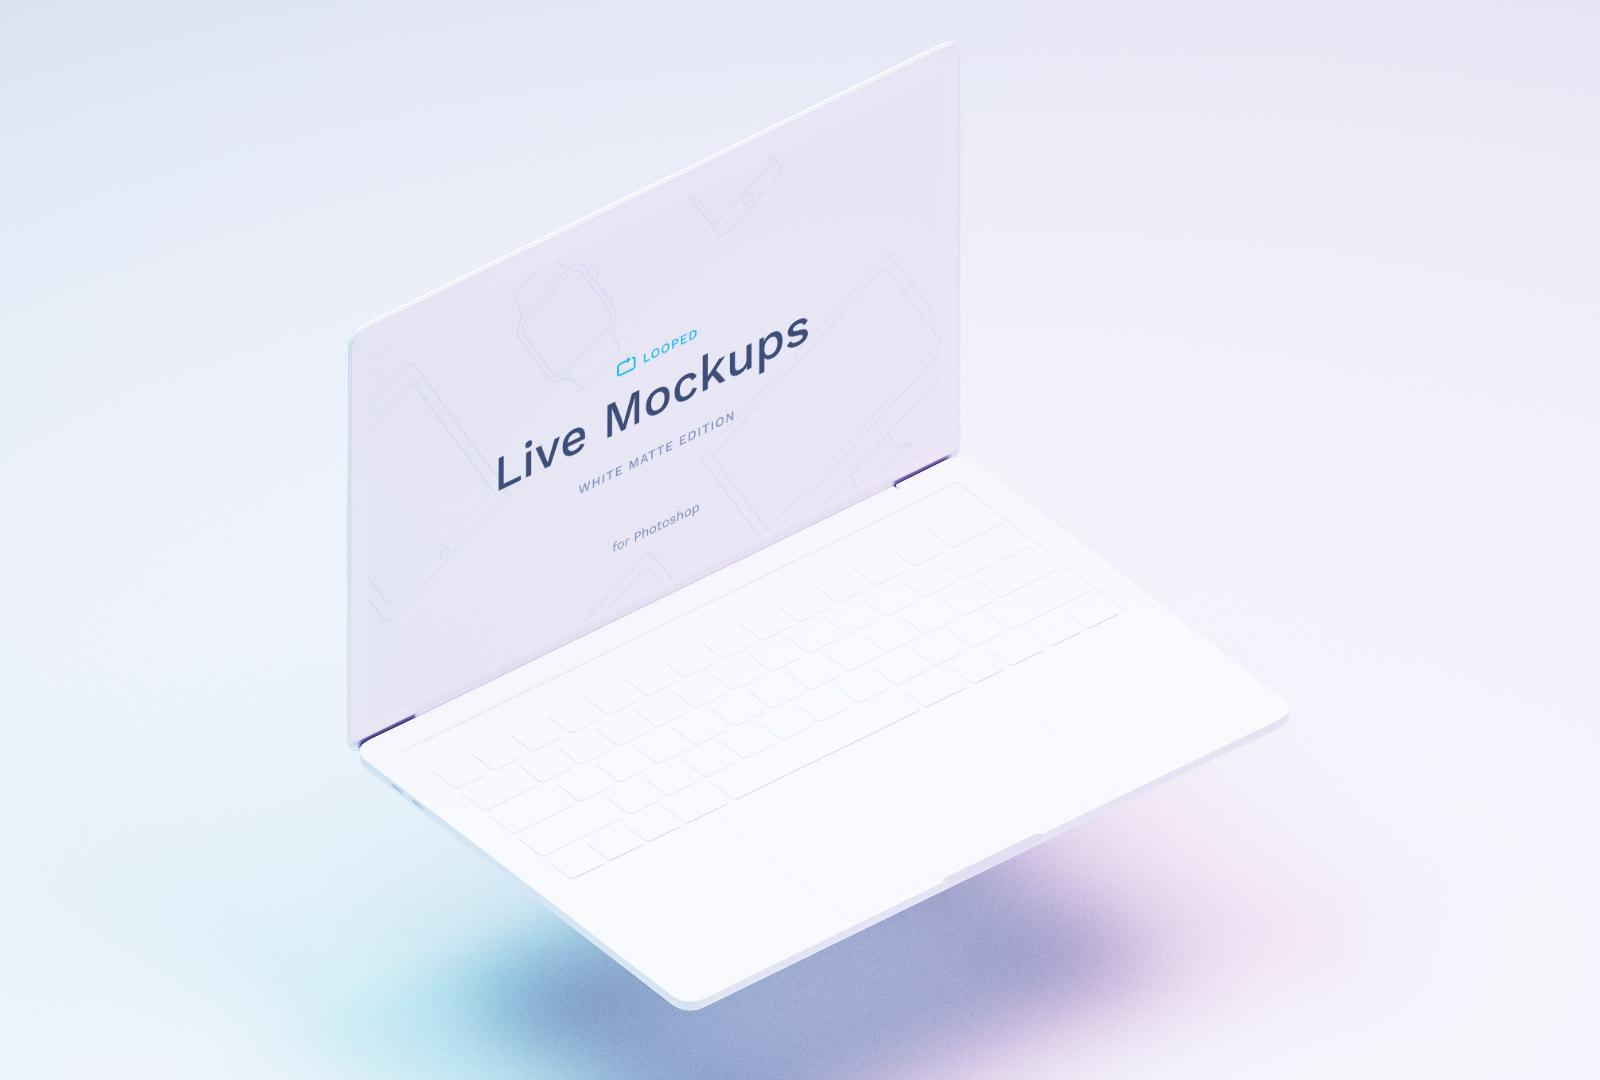 Free Macbook White Mockup PSD